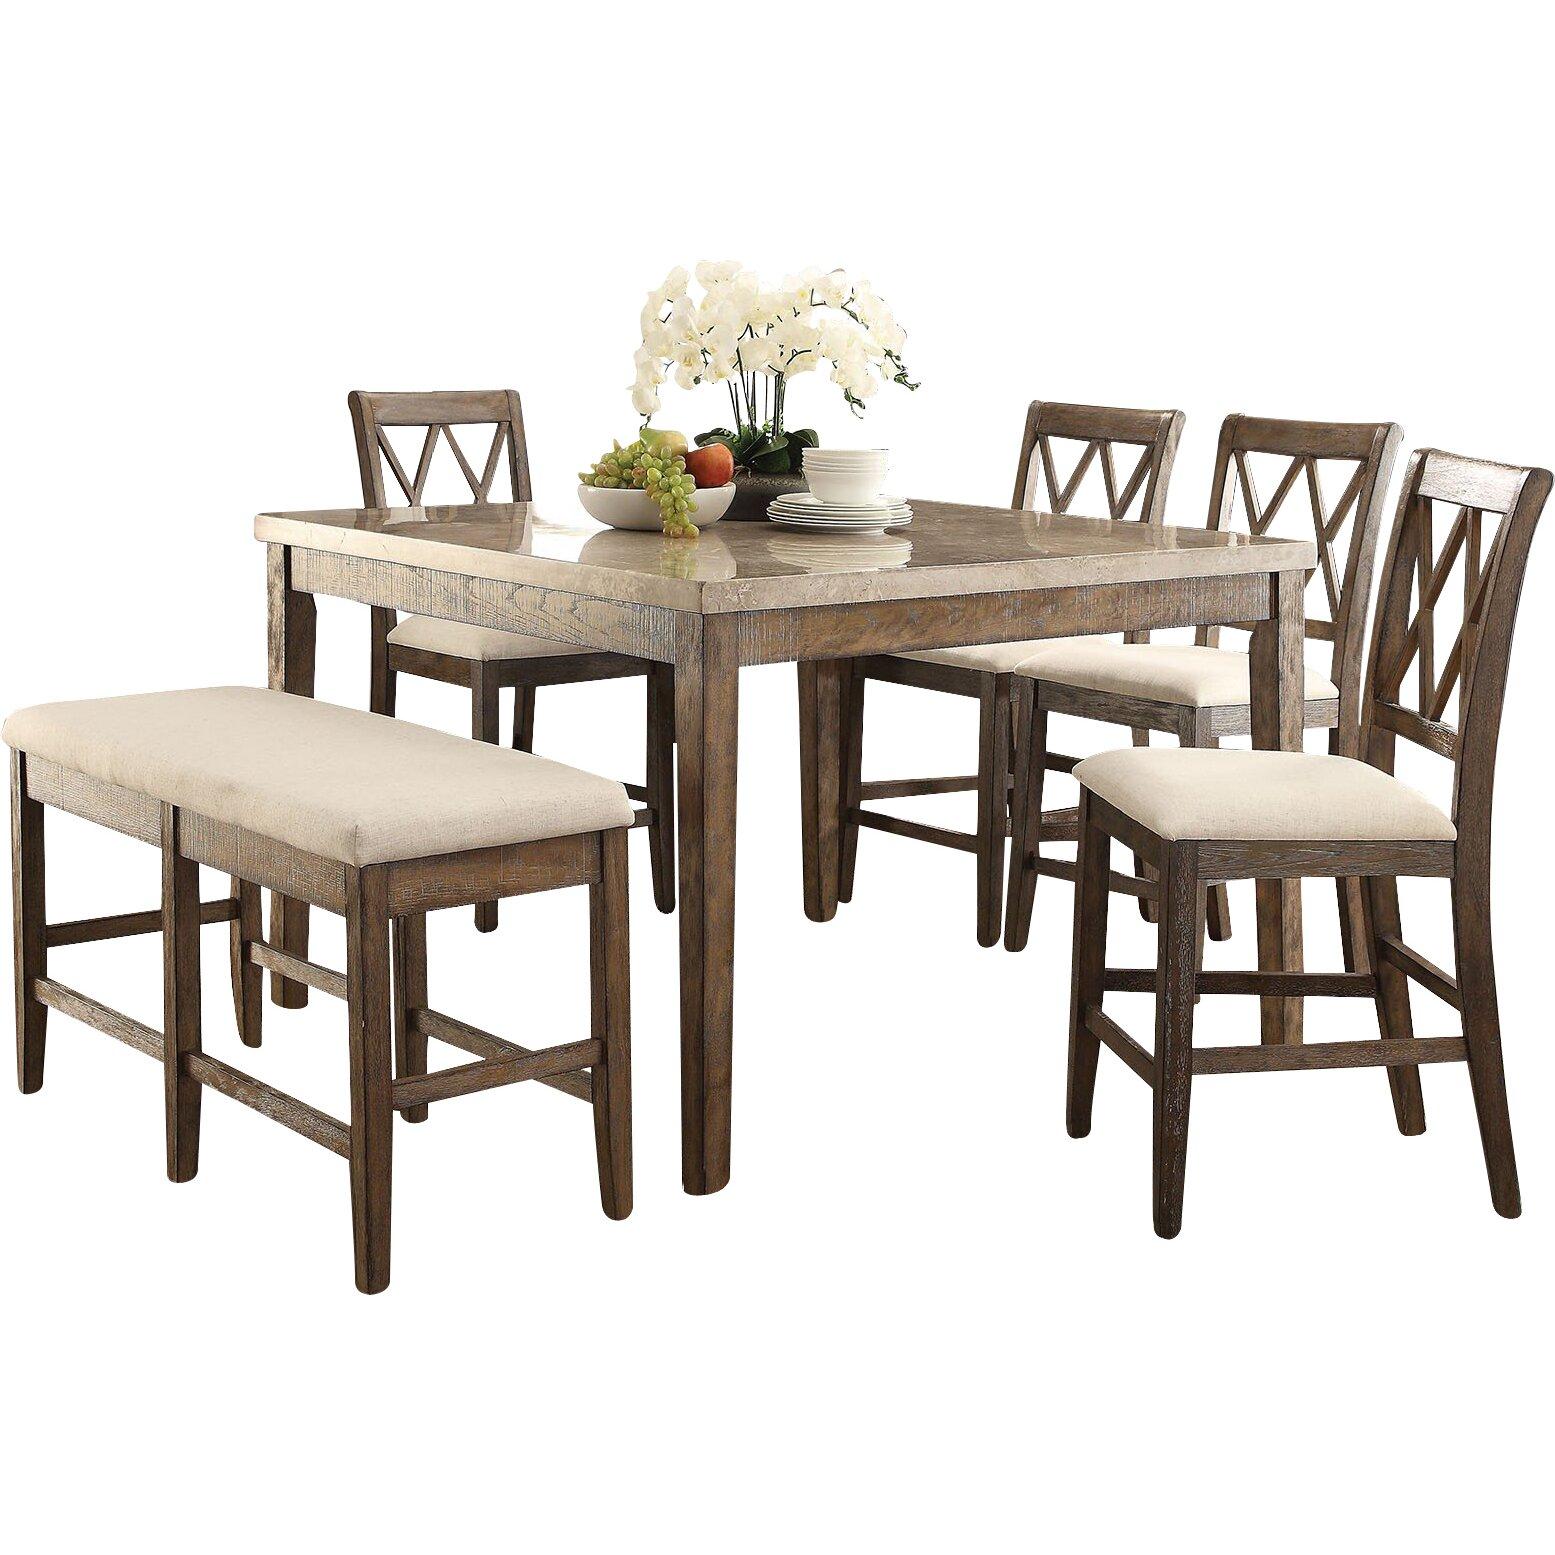 Infini Furnishings 6 Piece Counter Height Dining Set Wayfair